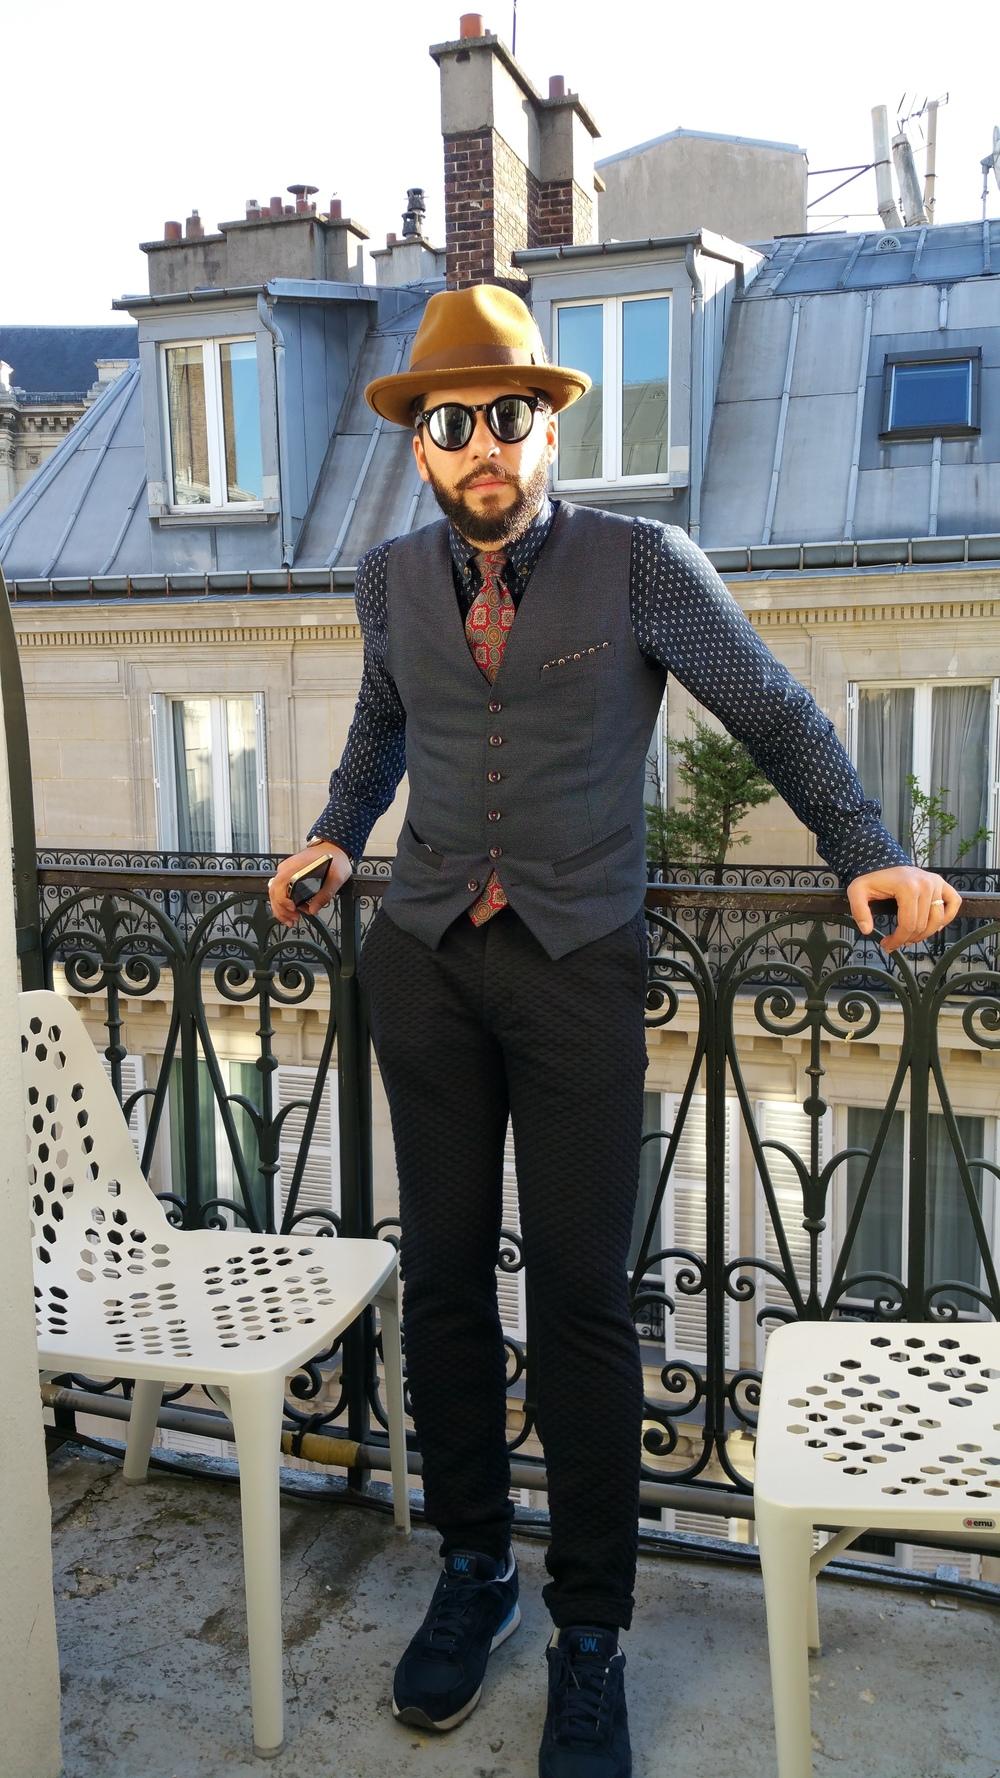 Balcony in Paris